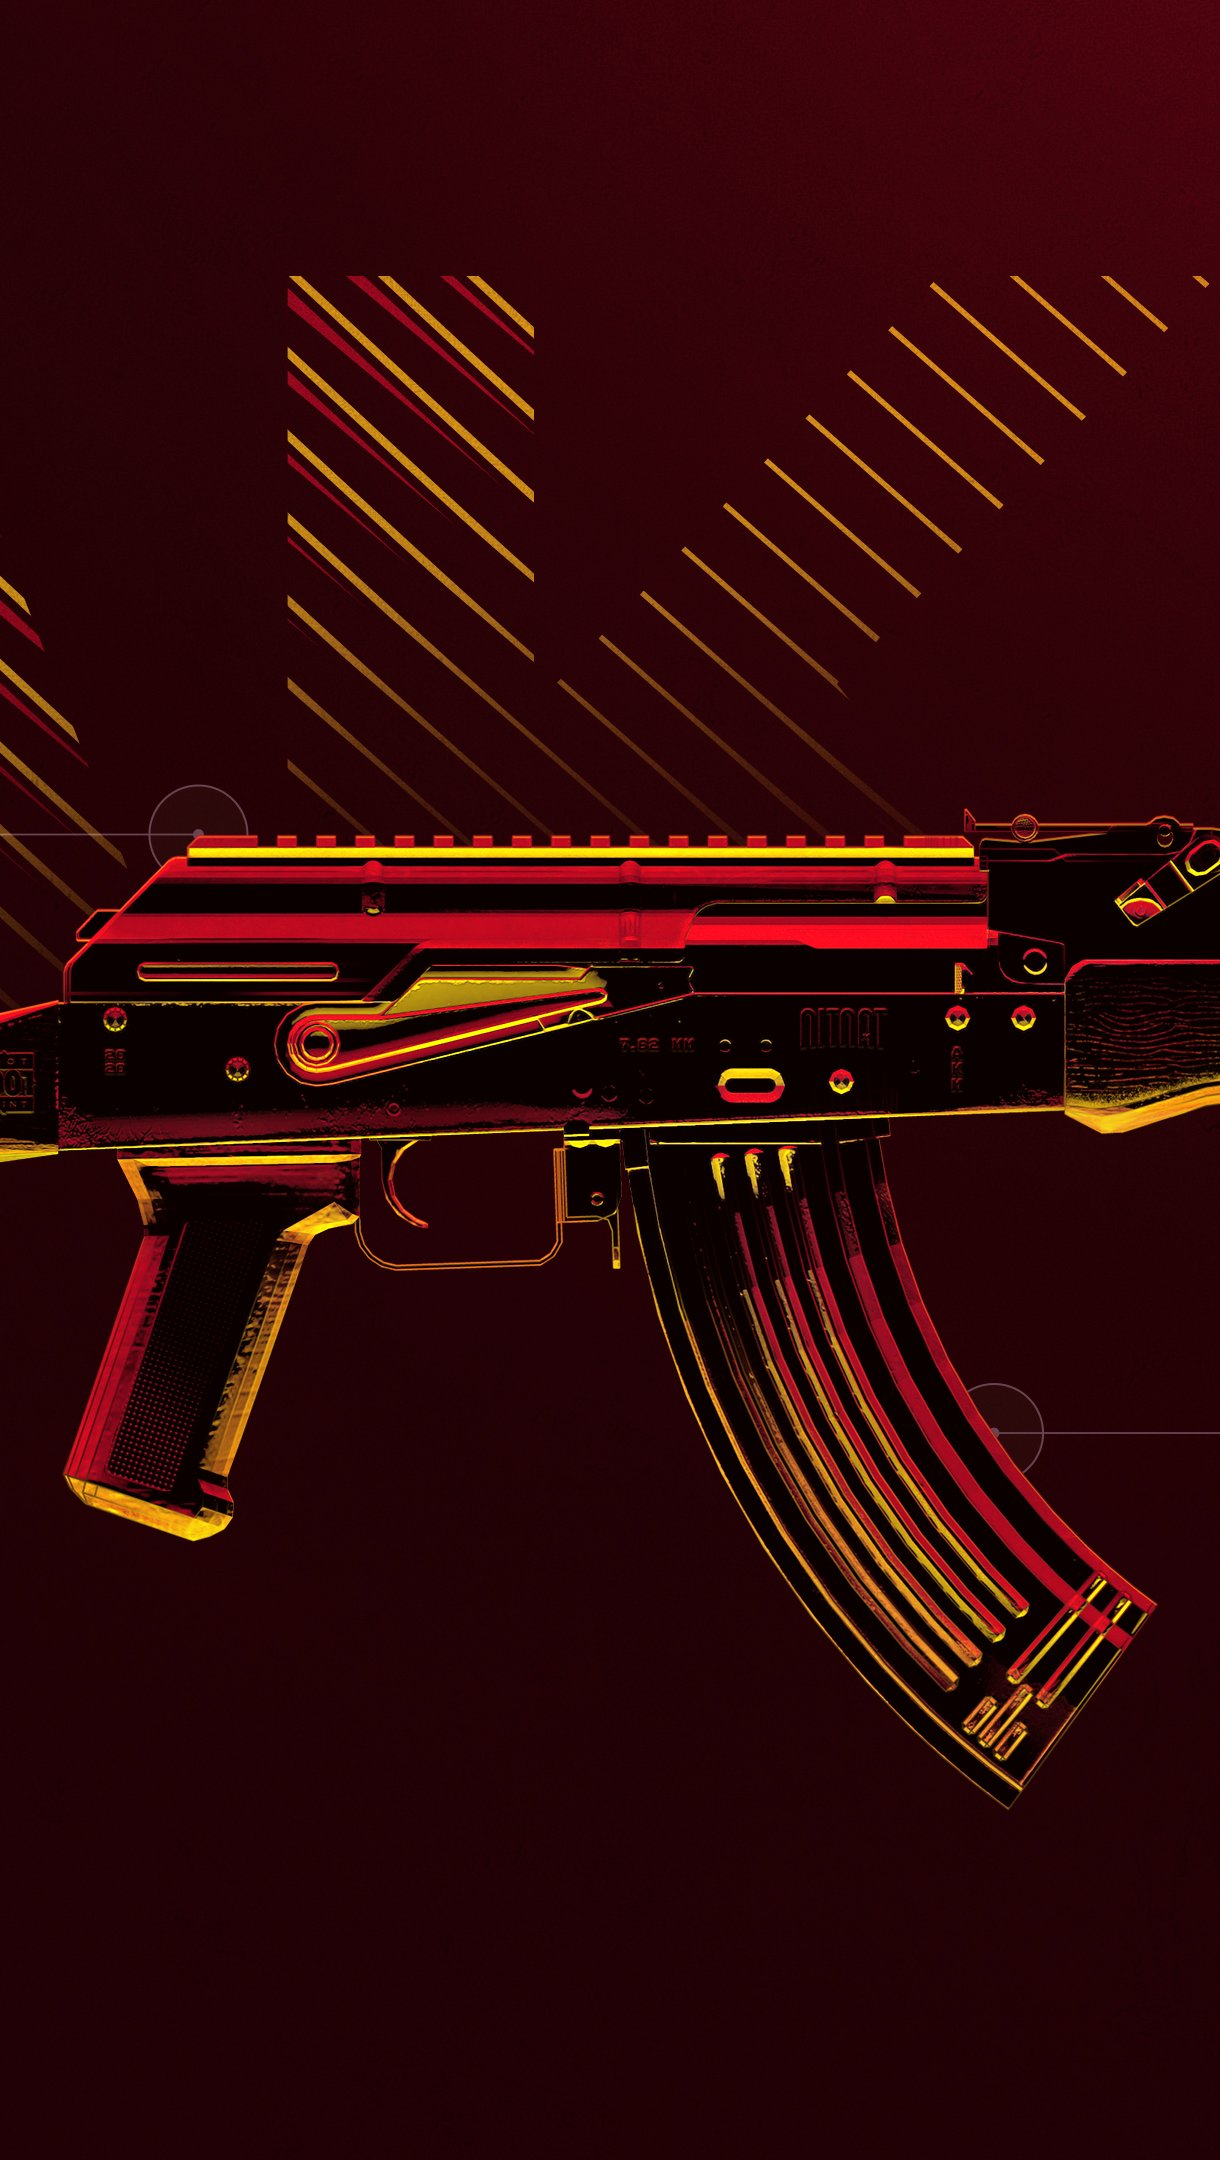 Fondos de pantalla Arma AKM de PUBG Vertical